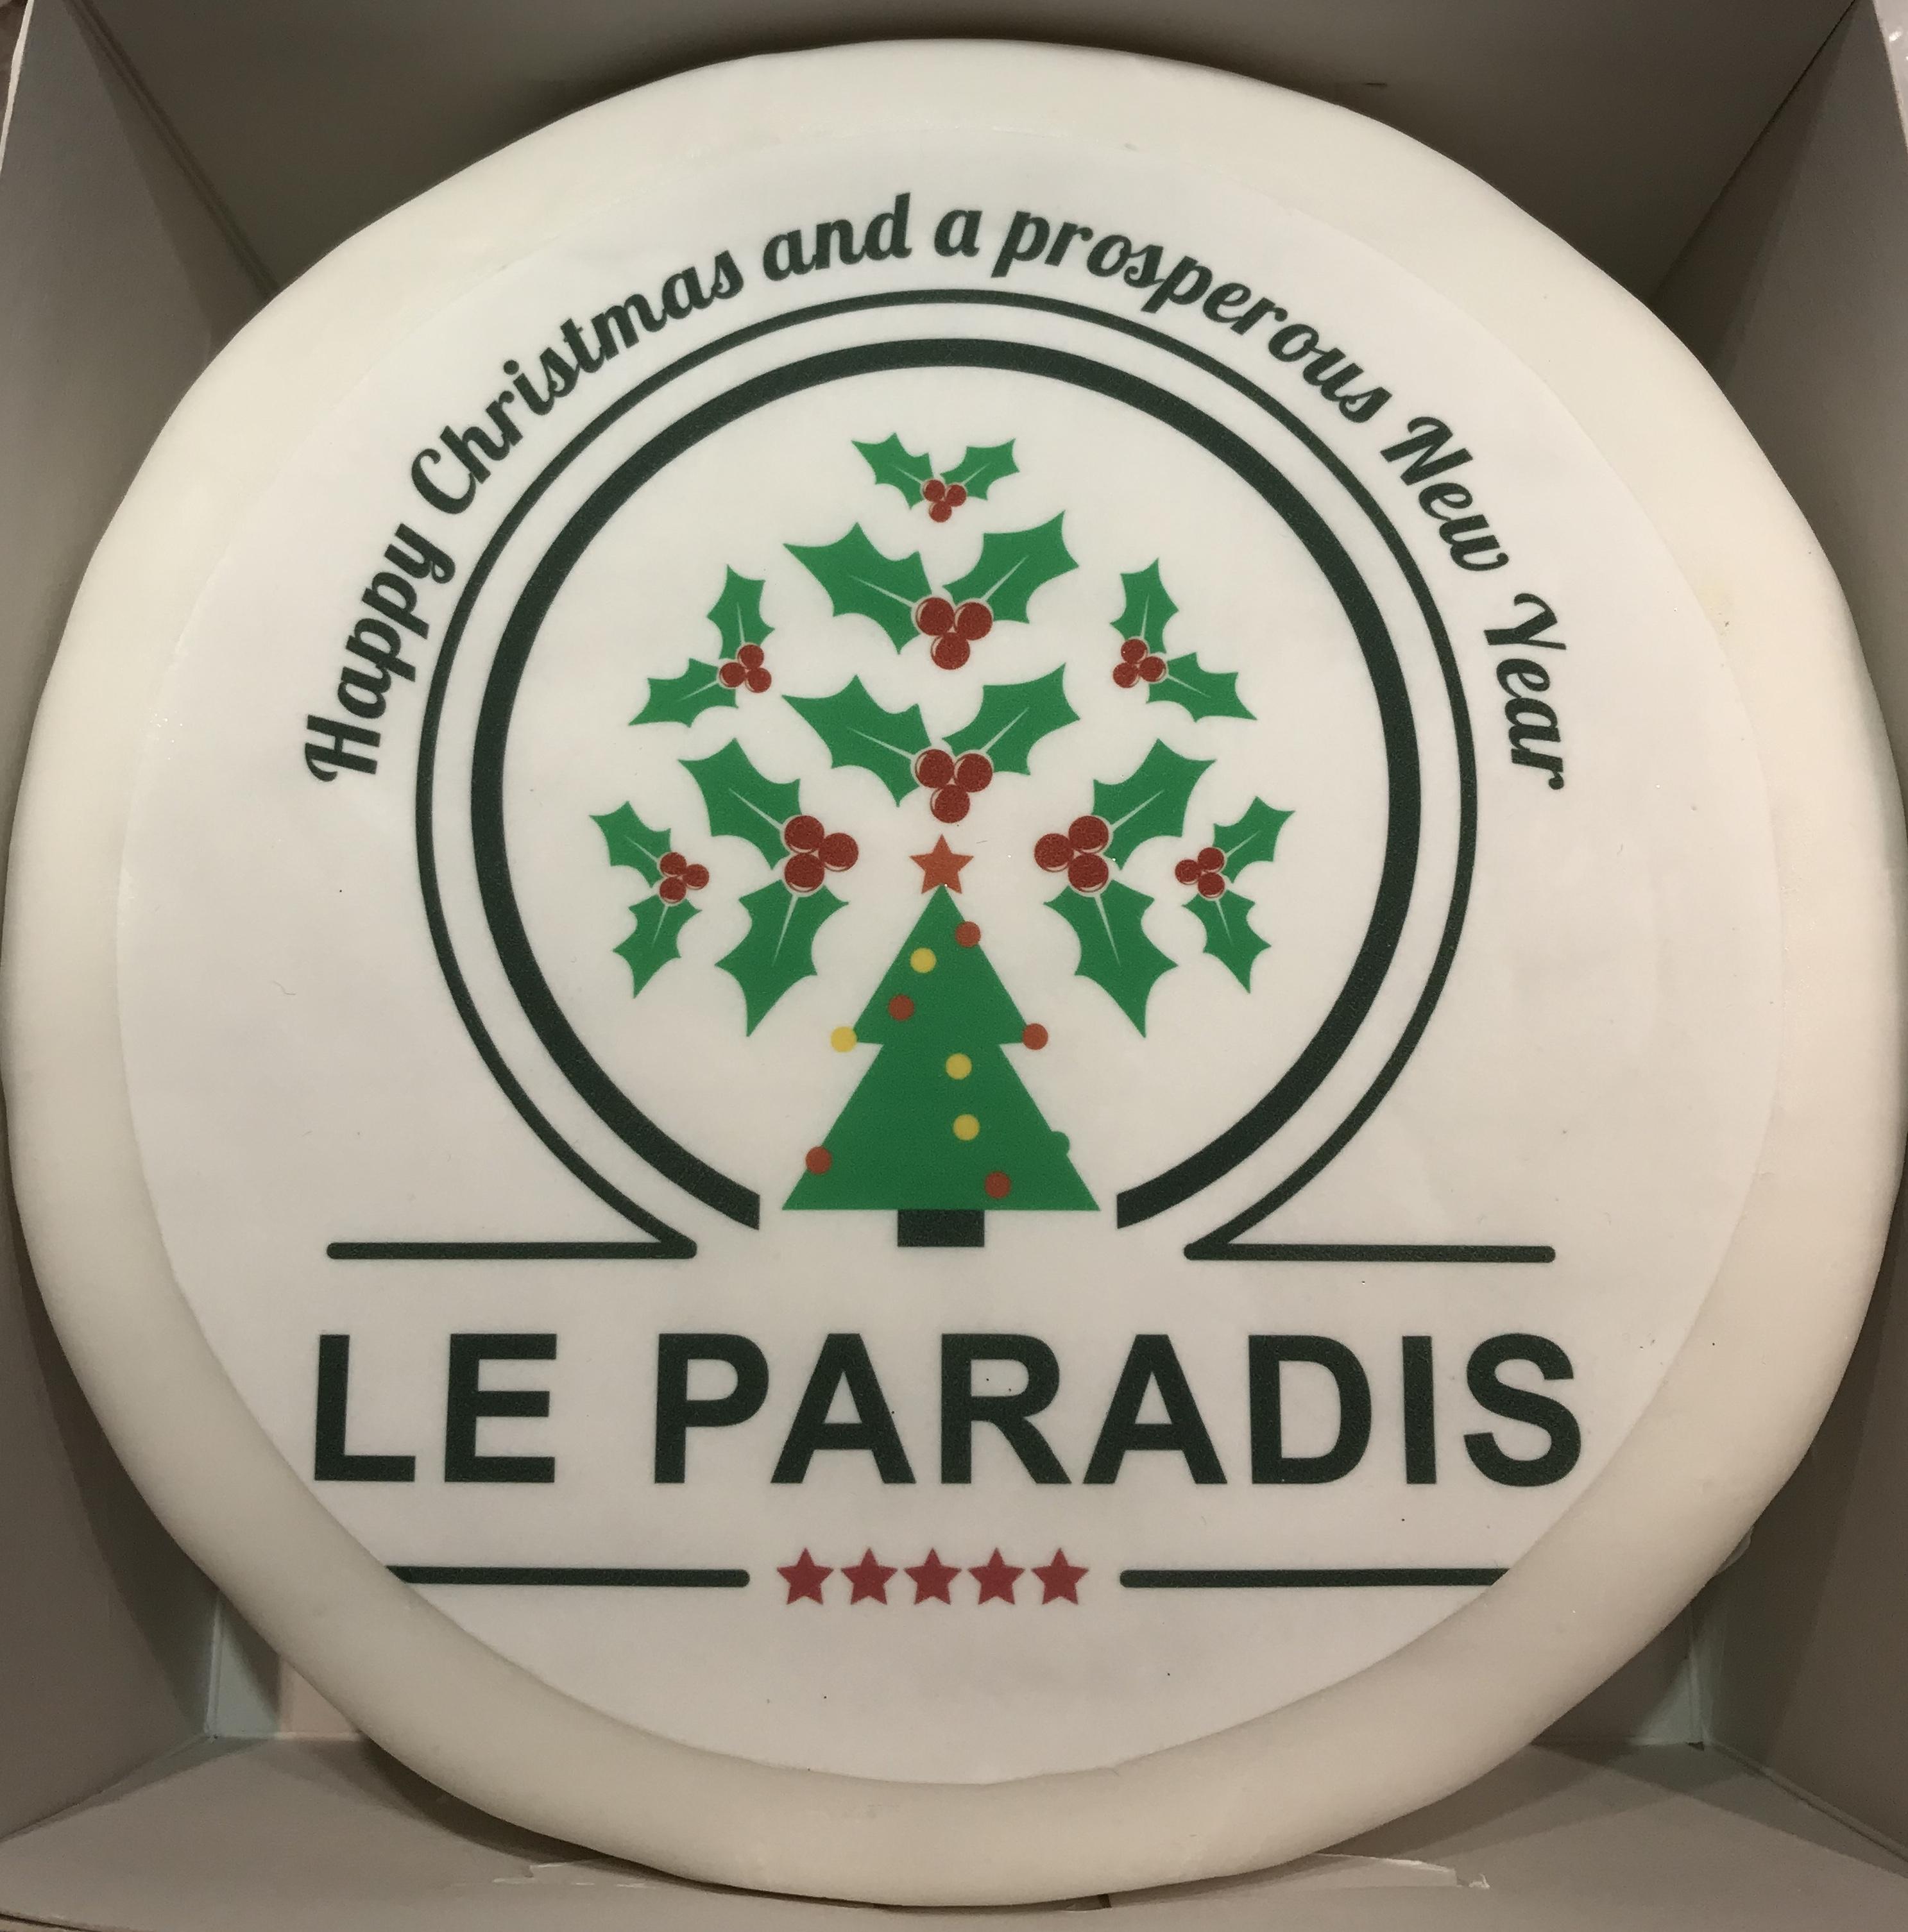 Camping Le Paradis Christmas cake